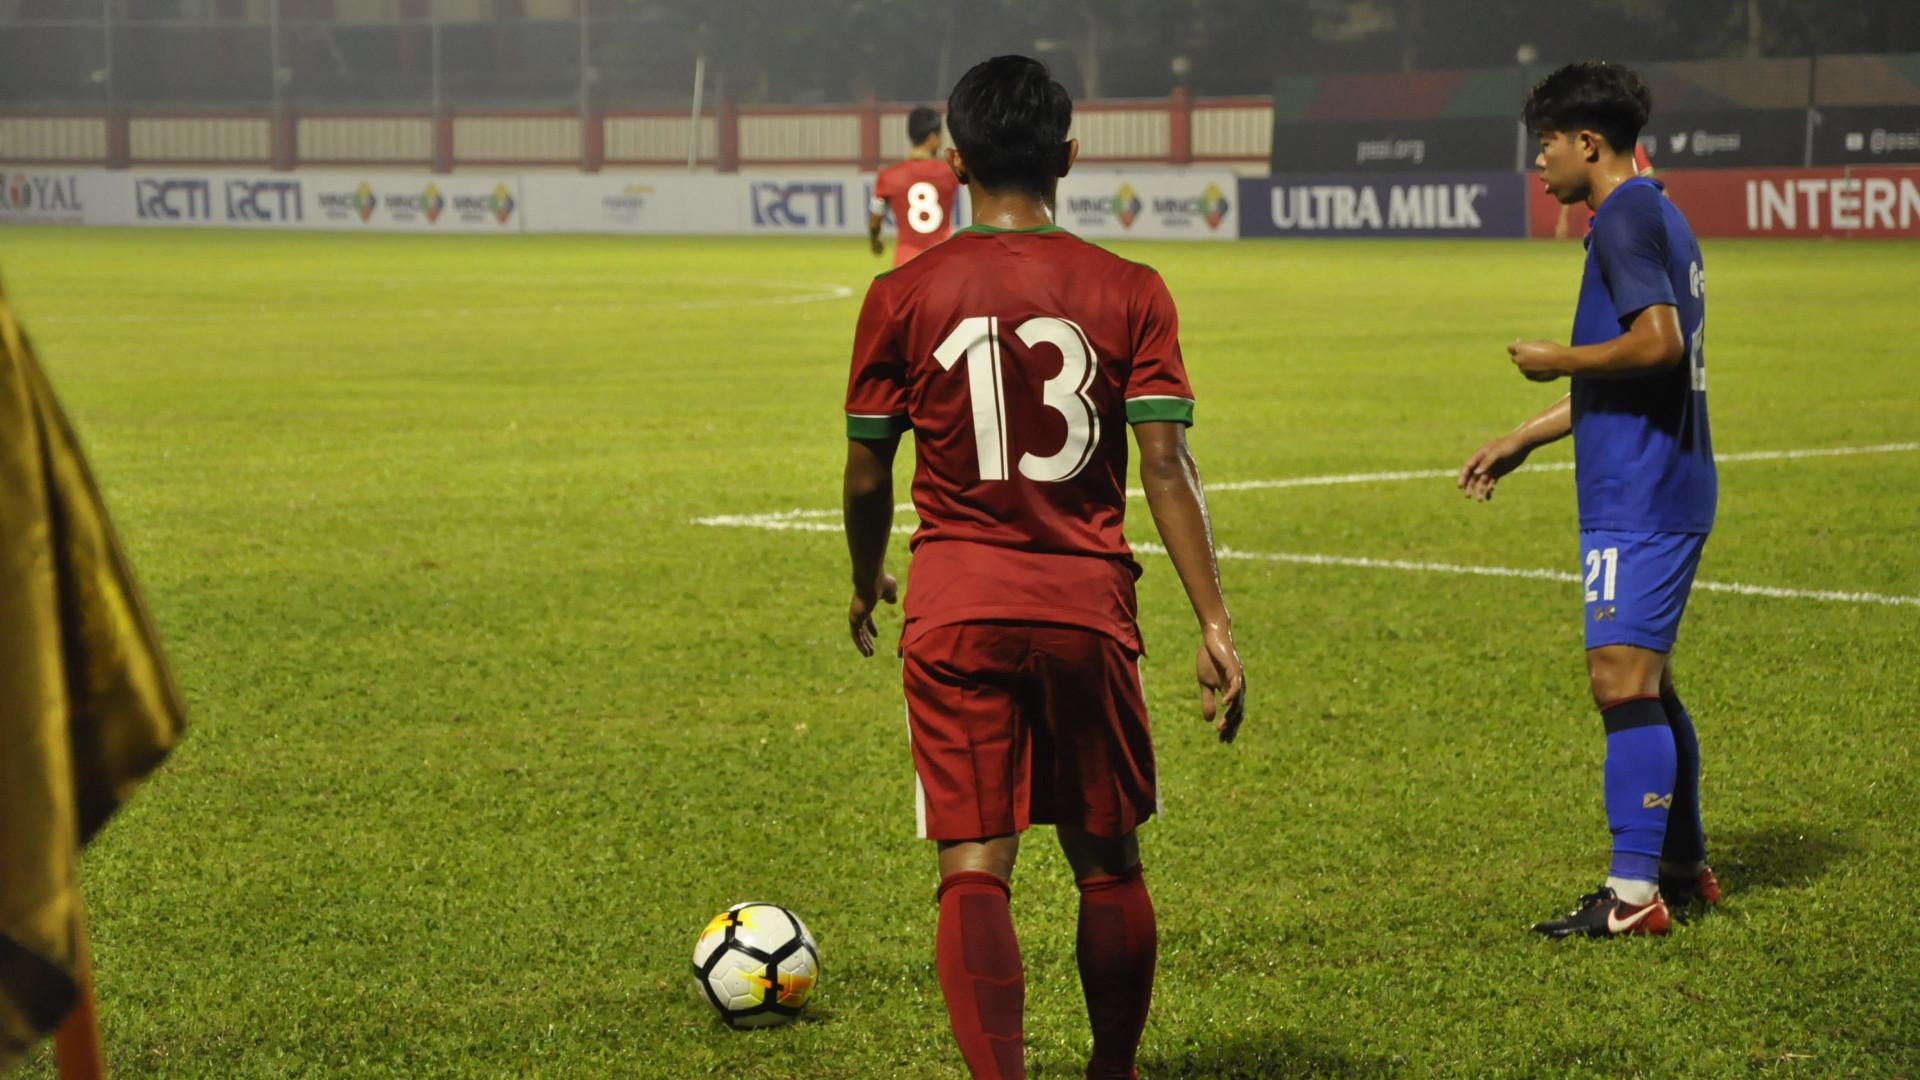 Febri Hariyadi - Indonesia